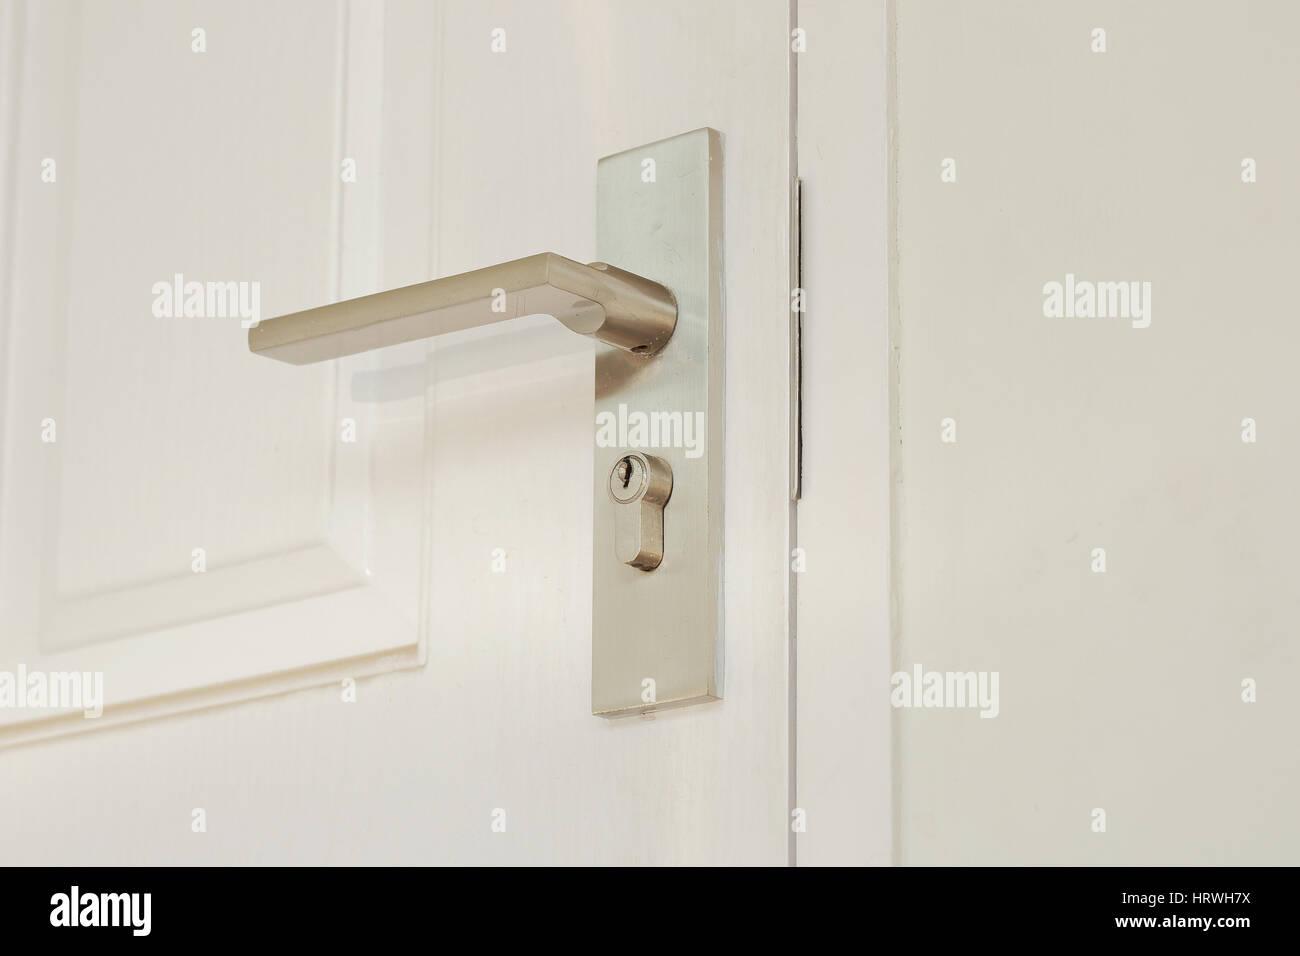 La perilla de la puerta metálica blanca horizontal Foto de stock